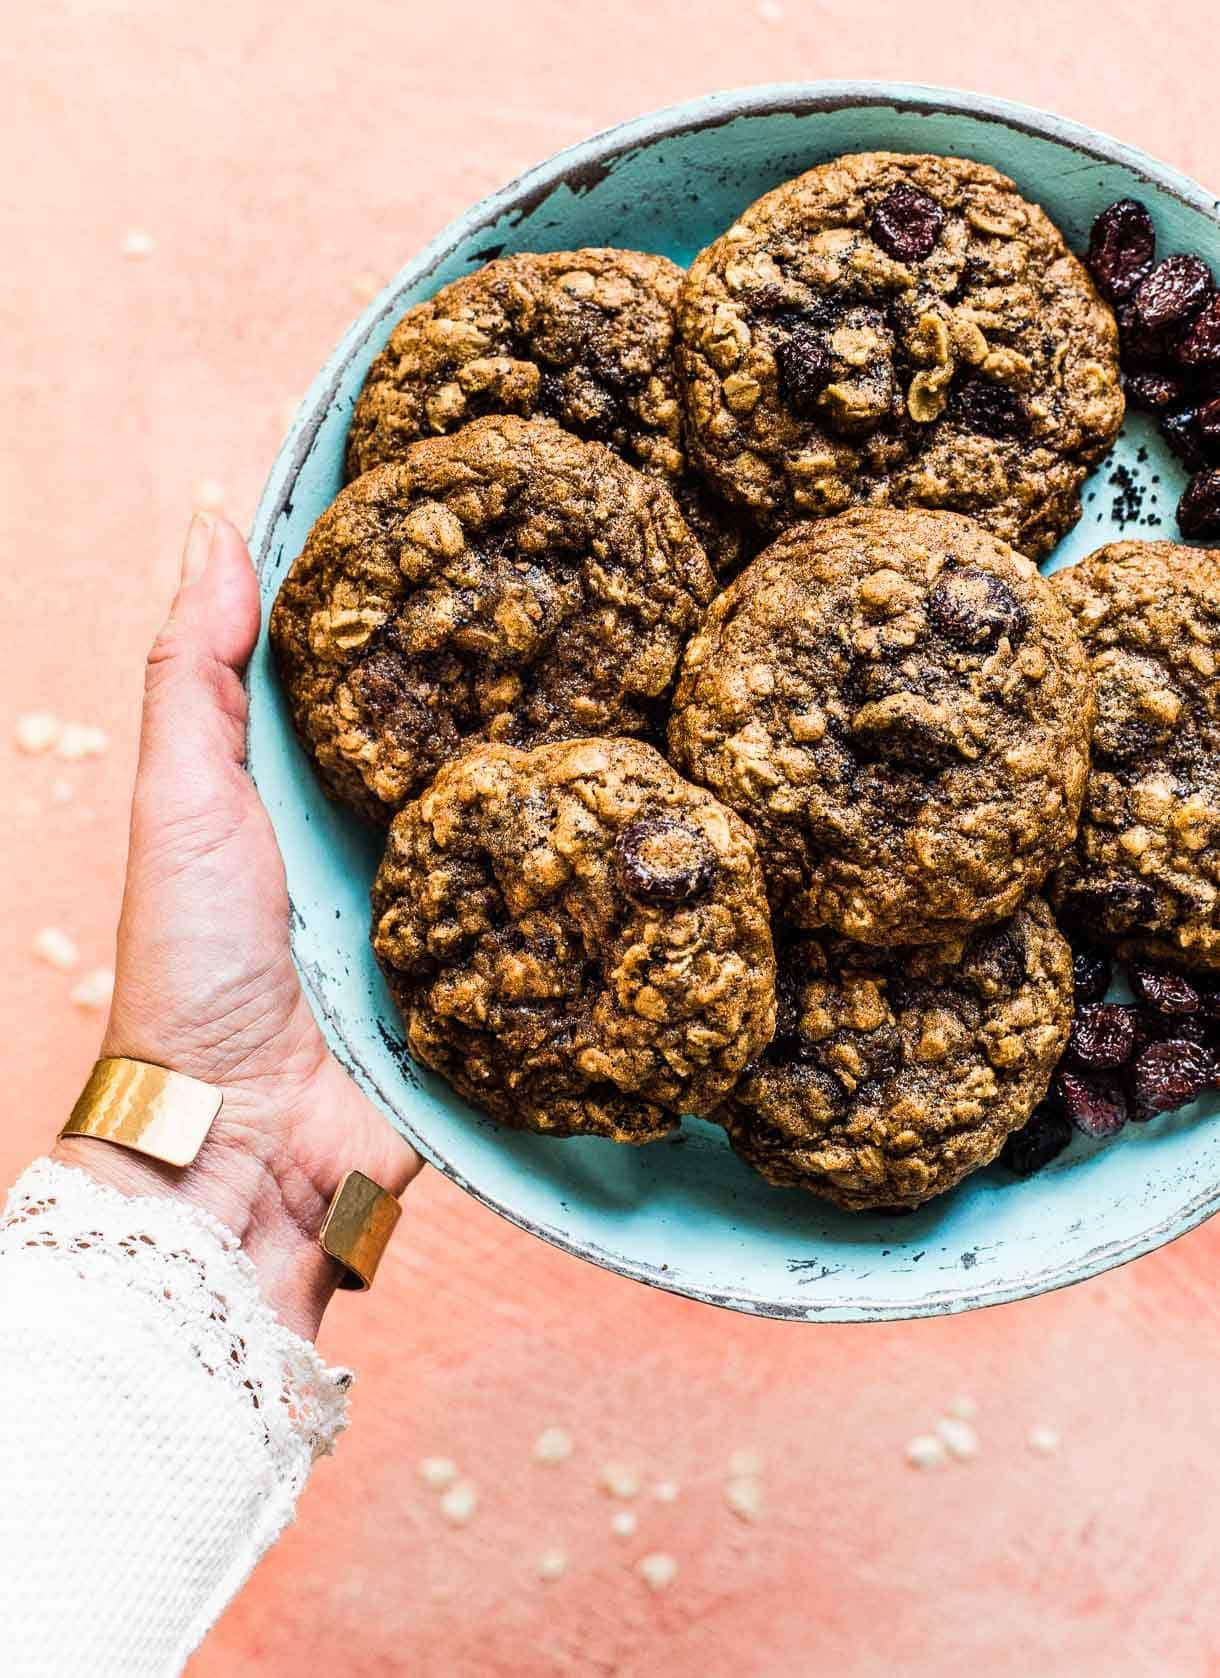 Cranberry Poppy Seed Gluten Free Oatmeal Cookies (recipe)